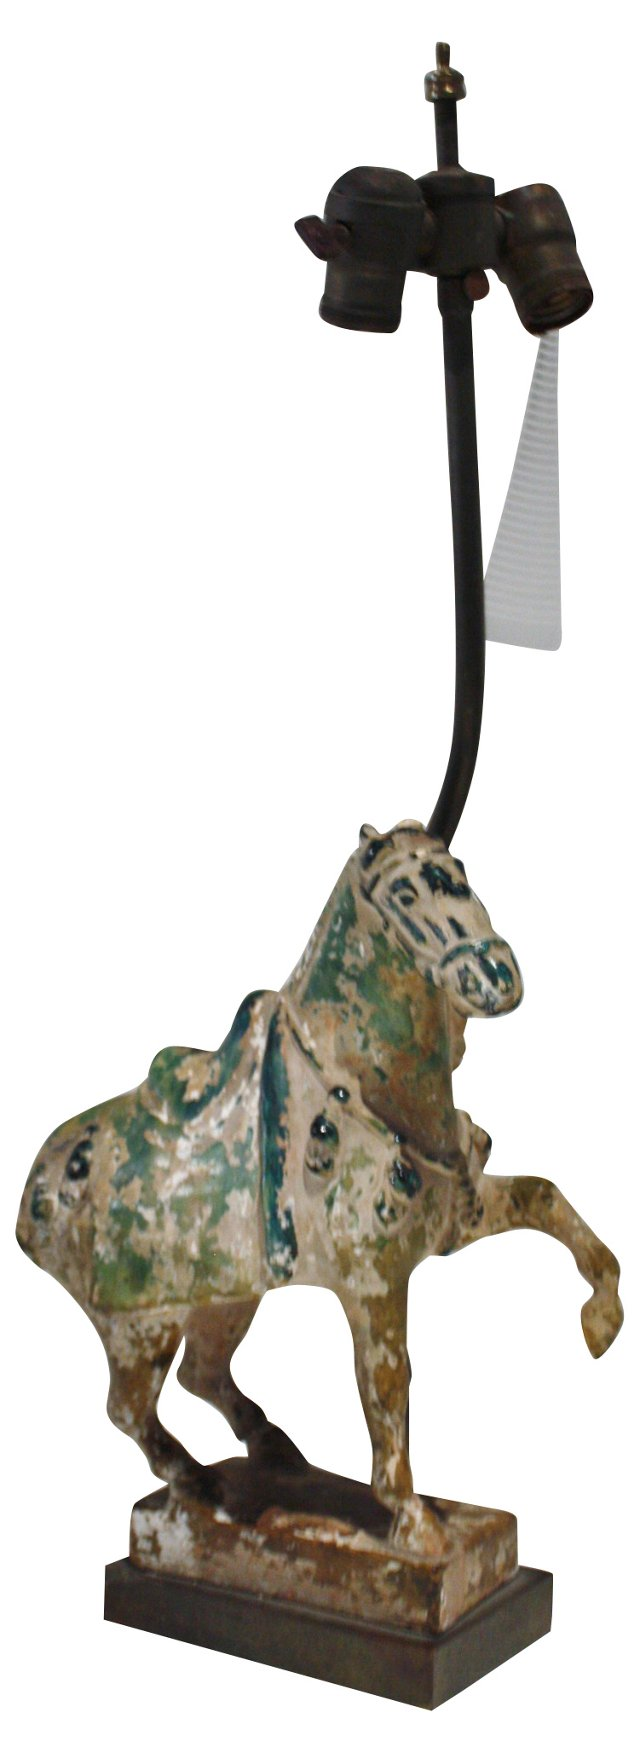 1920s Chinese Tang Horse Lamp